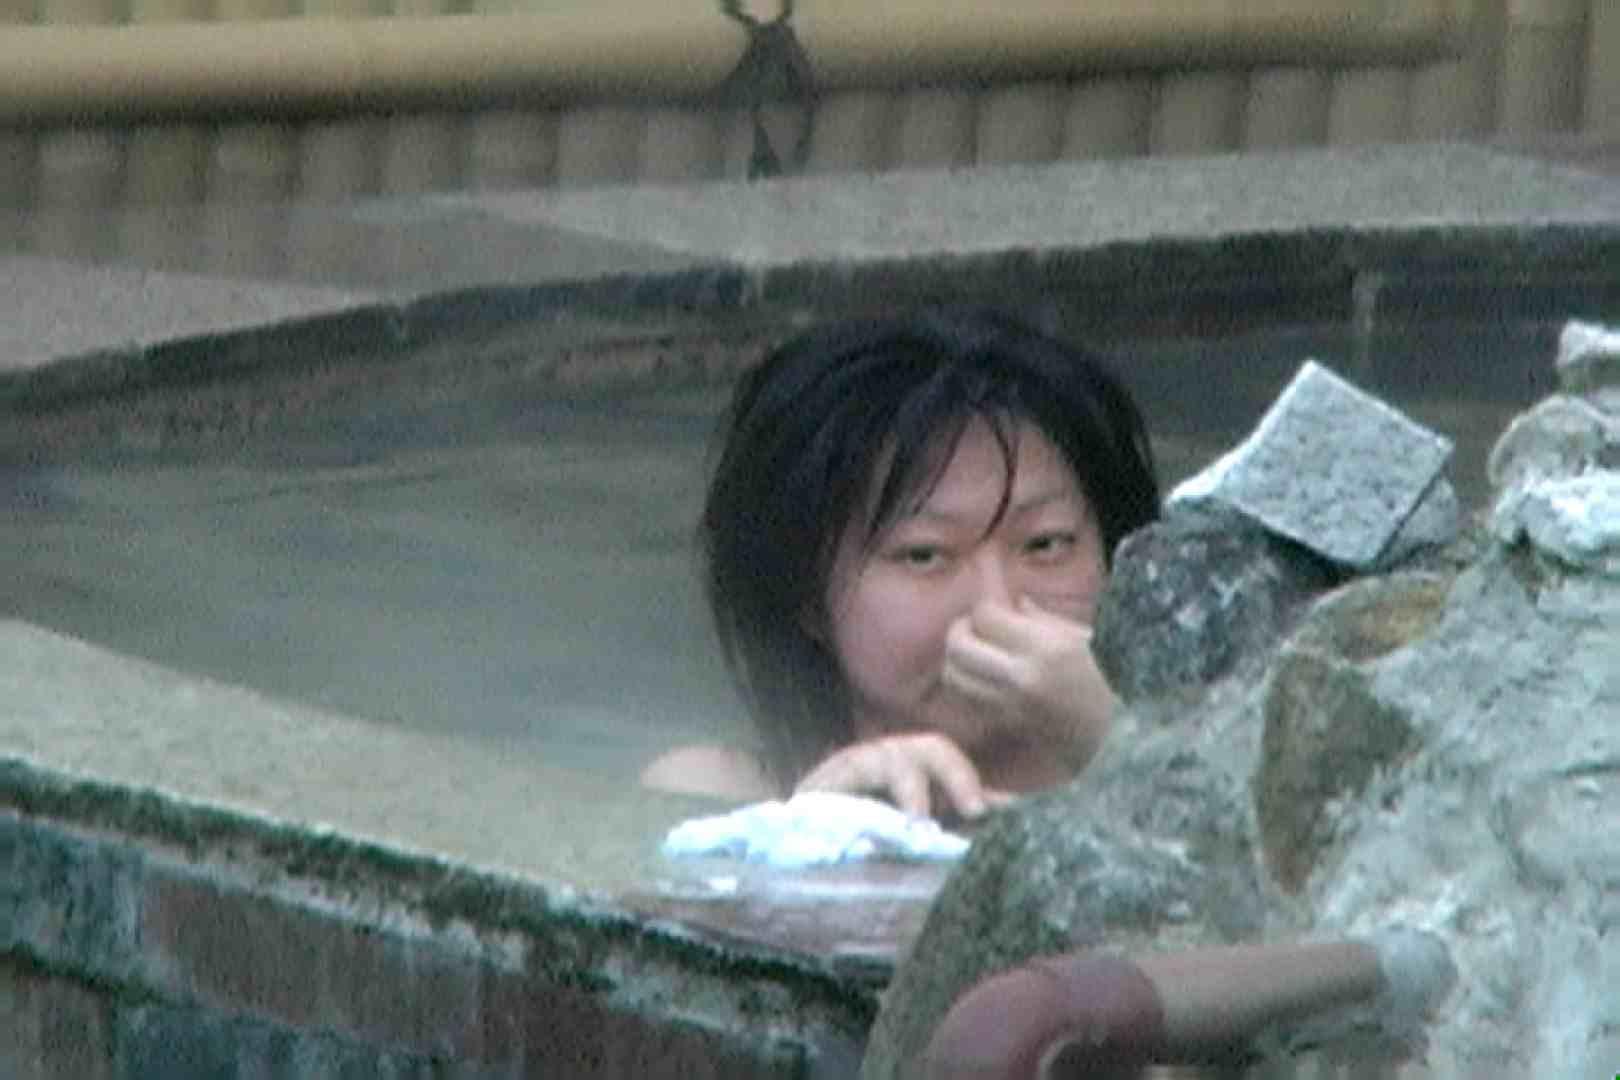 Aquaな露天風呂Vol.649 0 | 0  102連発 11